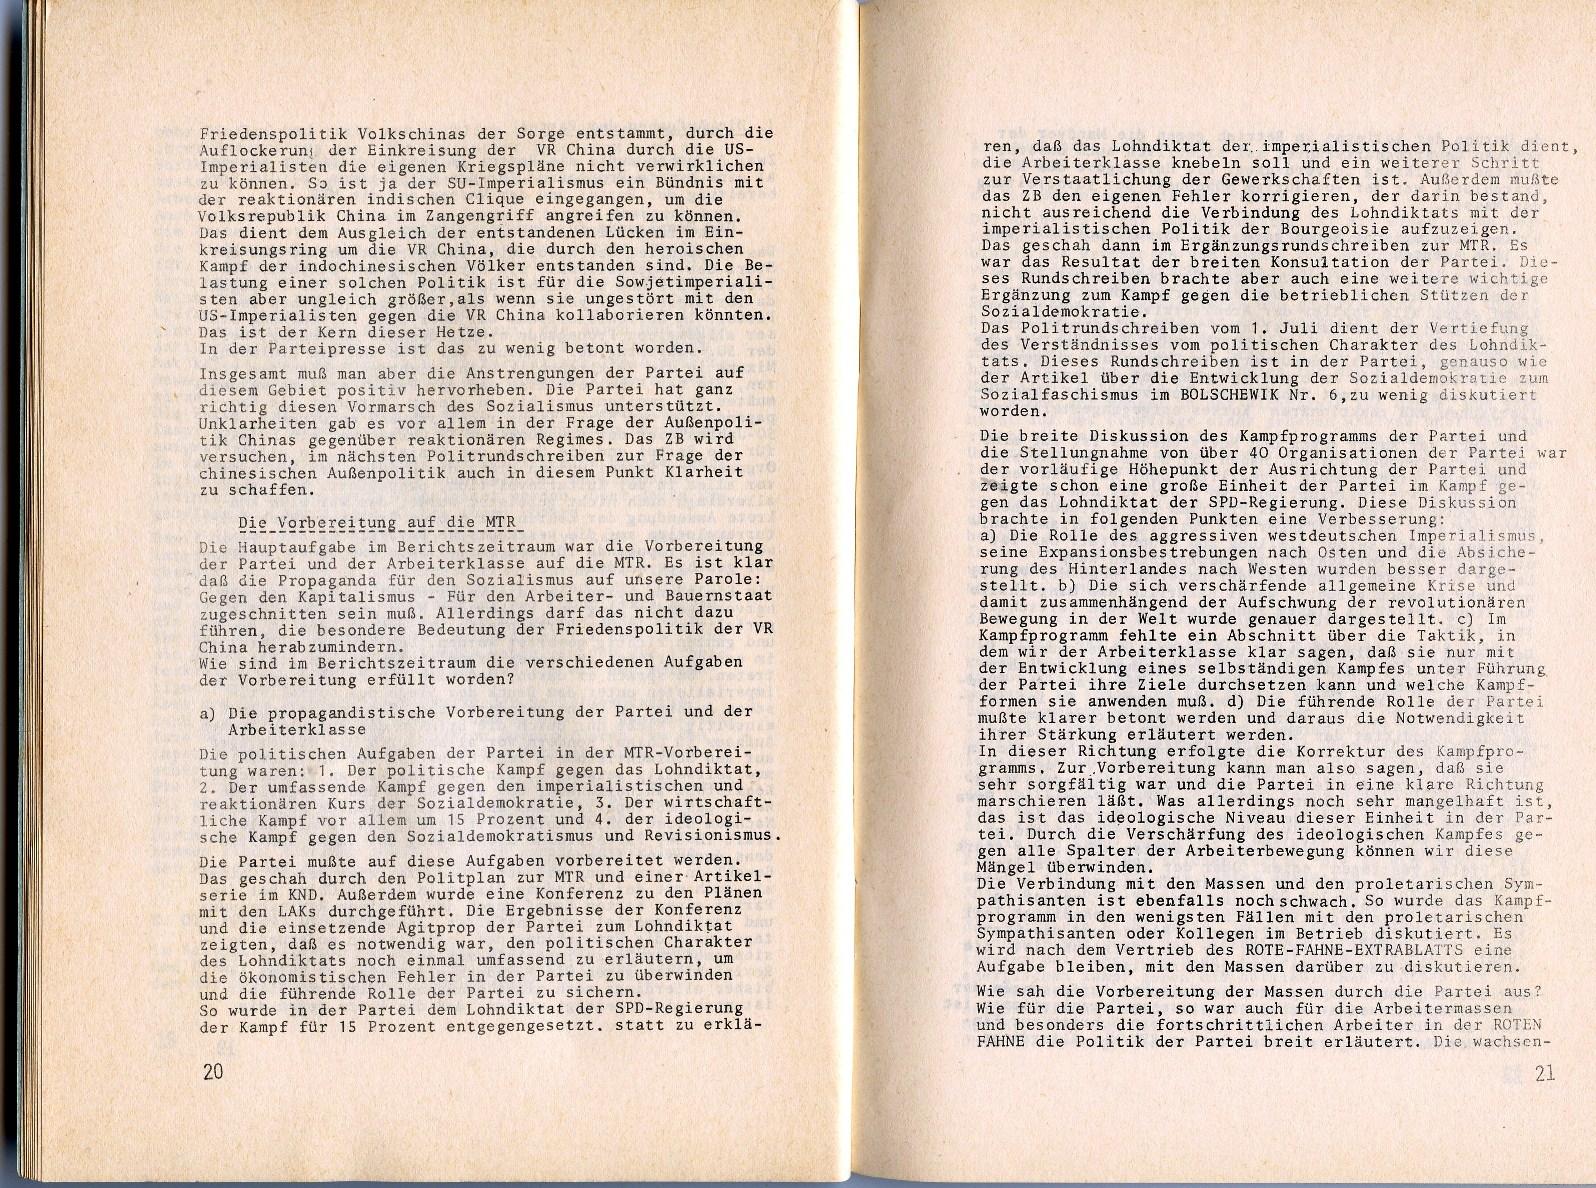 ZB_Parteiarbeiter_1971_07_12